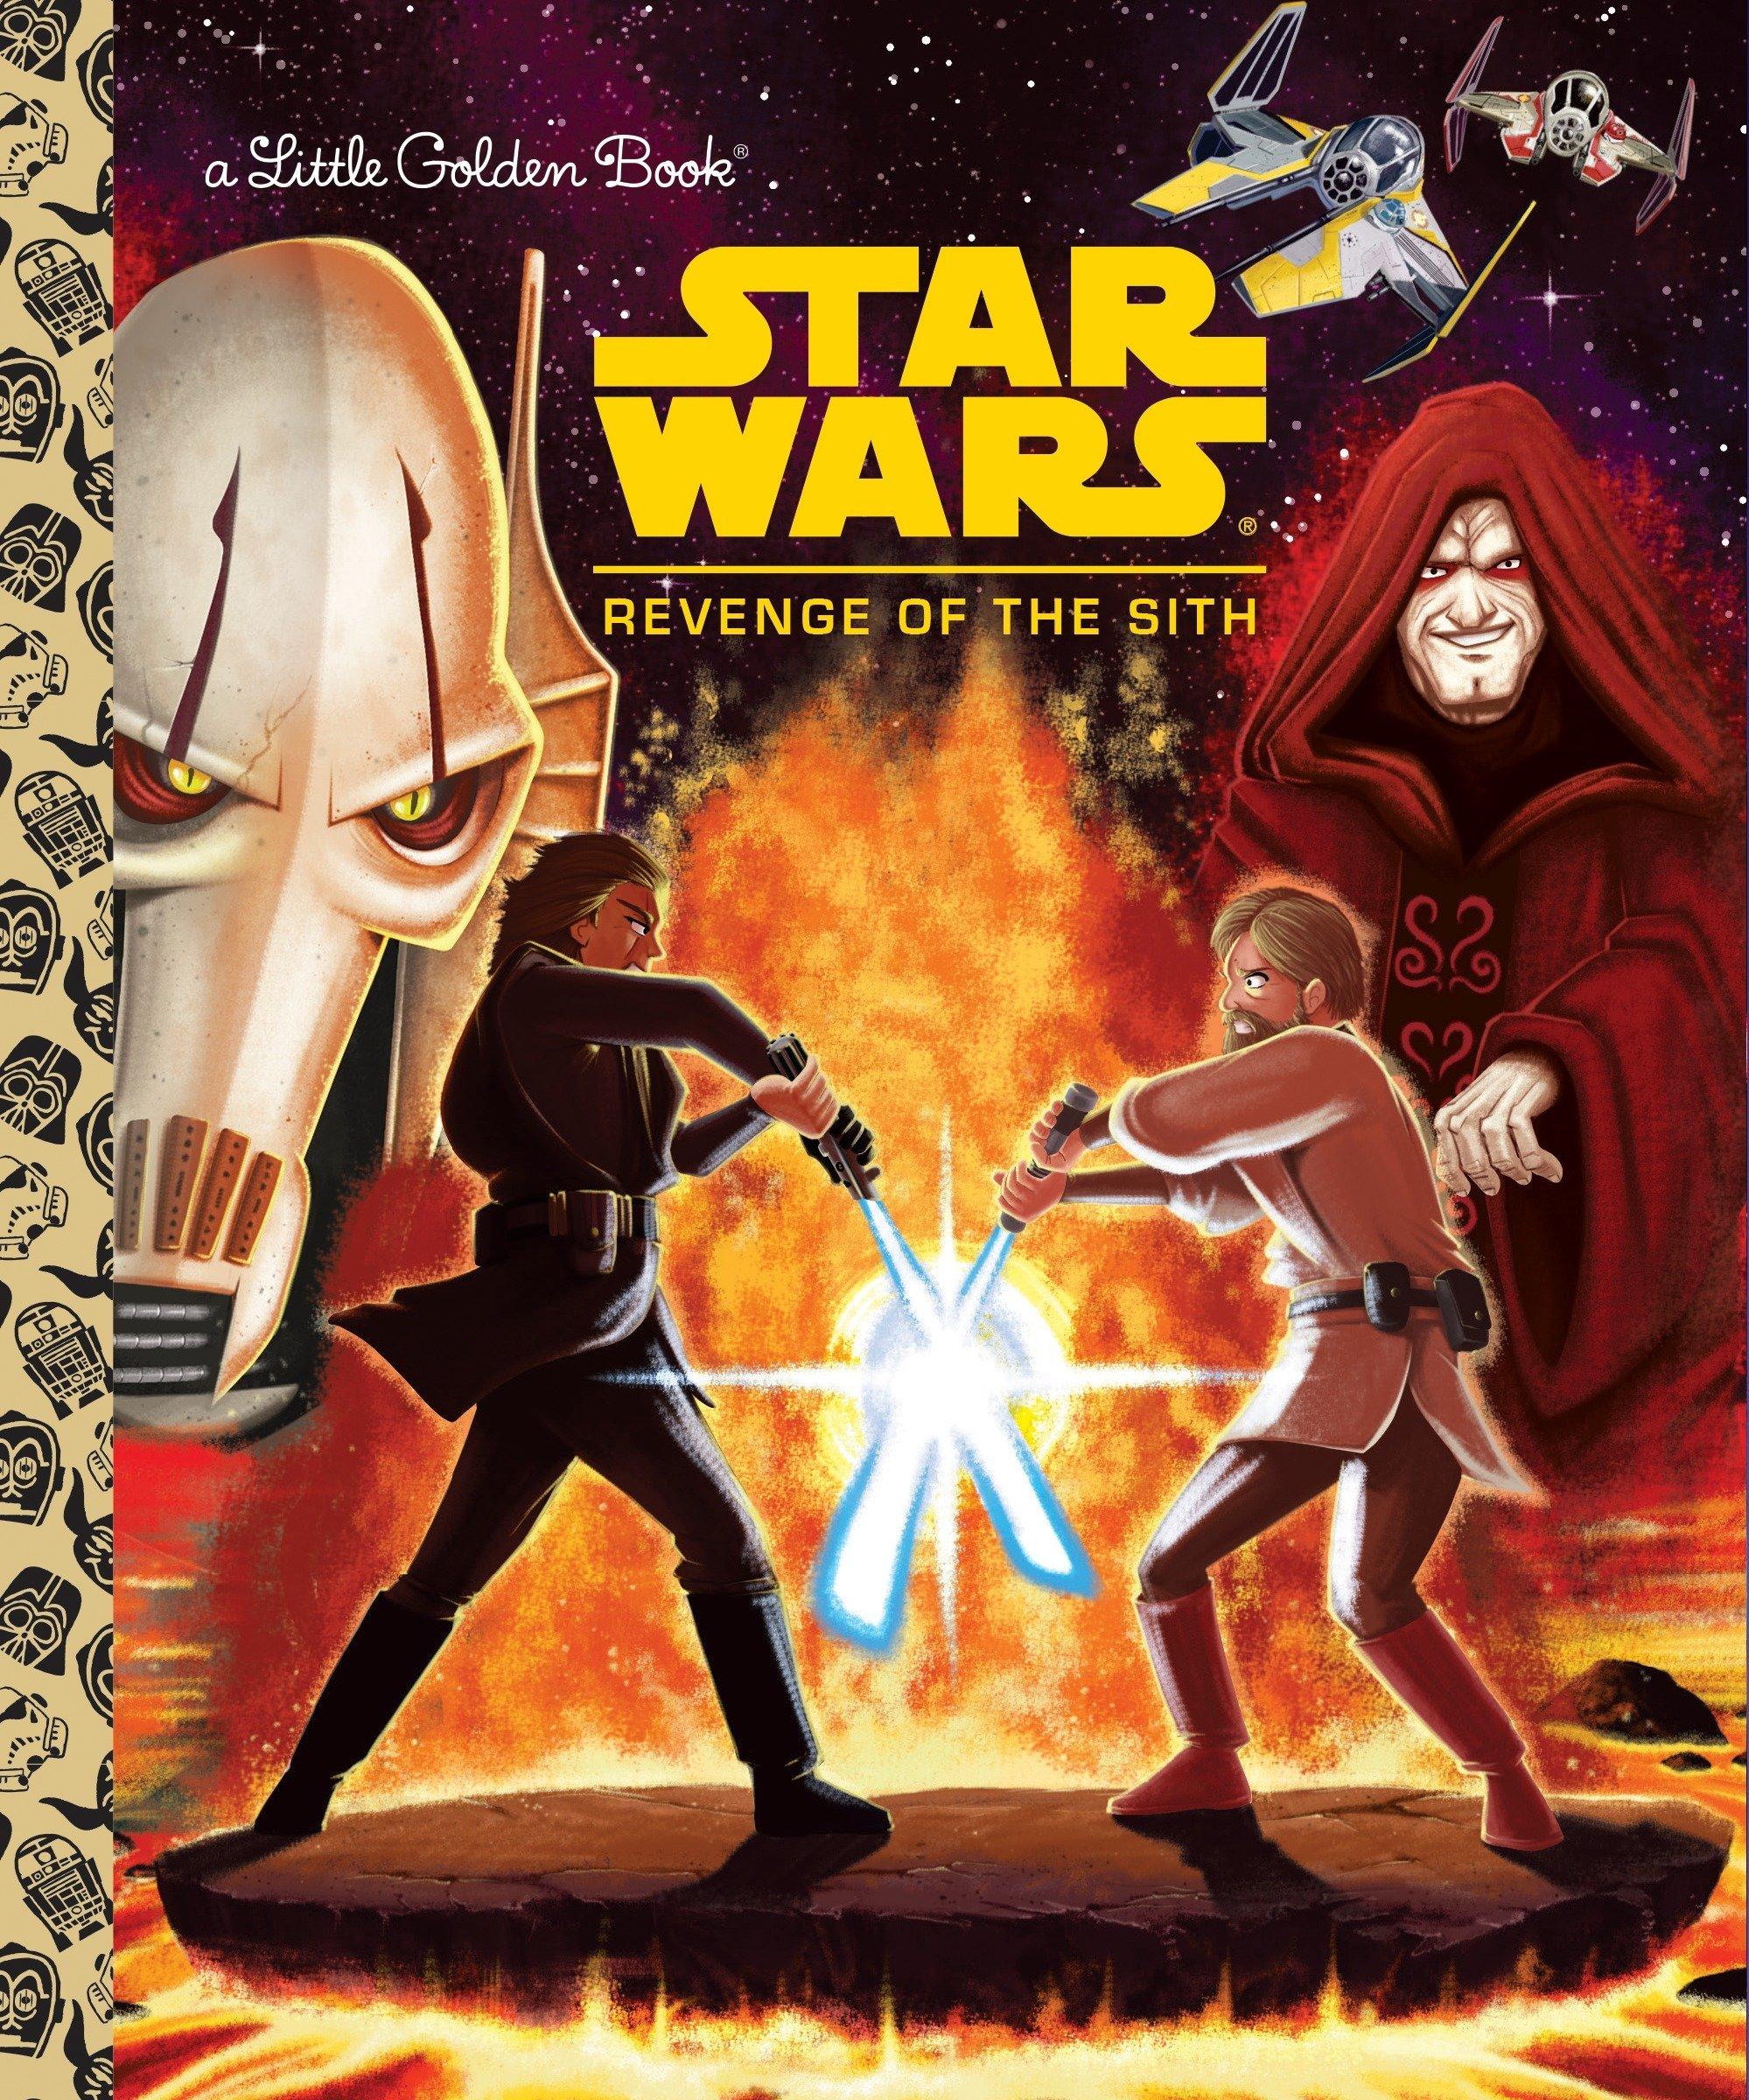 Star Wars Revenge Of The Sith Star Wars Little Golden Book Smith Geof Spaziante Patrick 9780736435406 Amazon Com Books